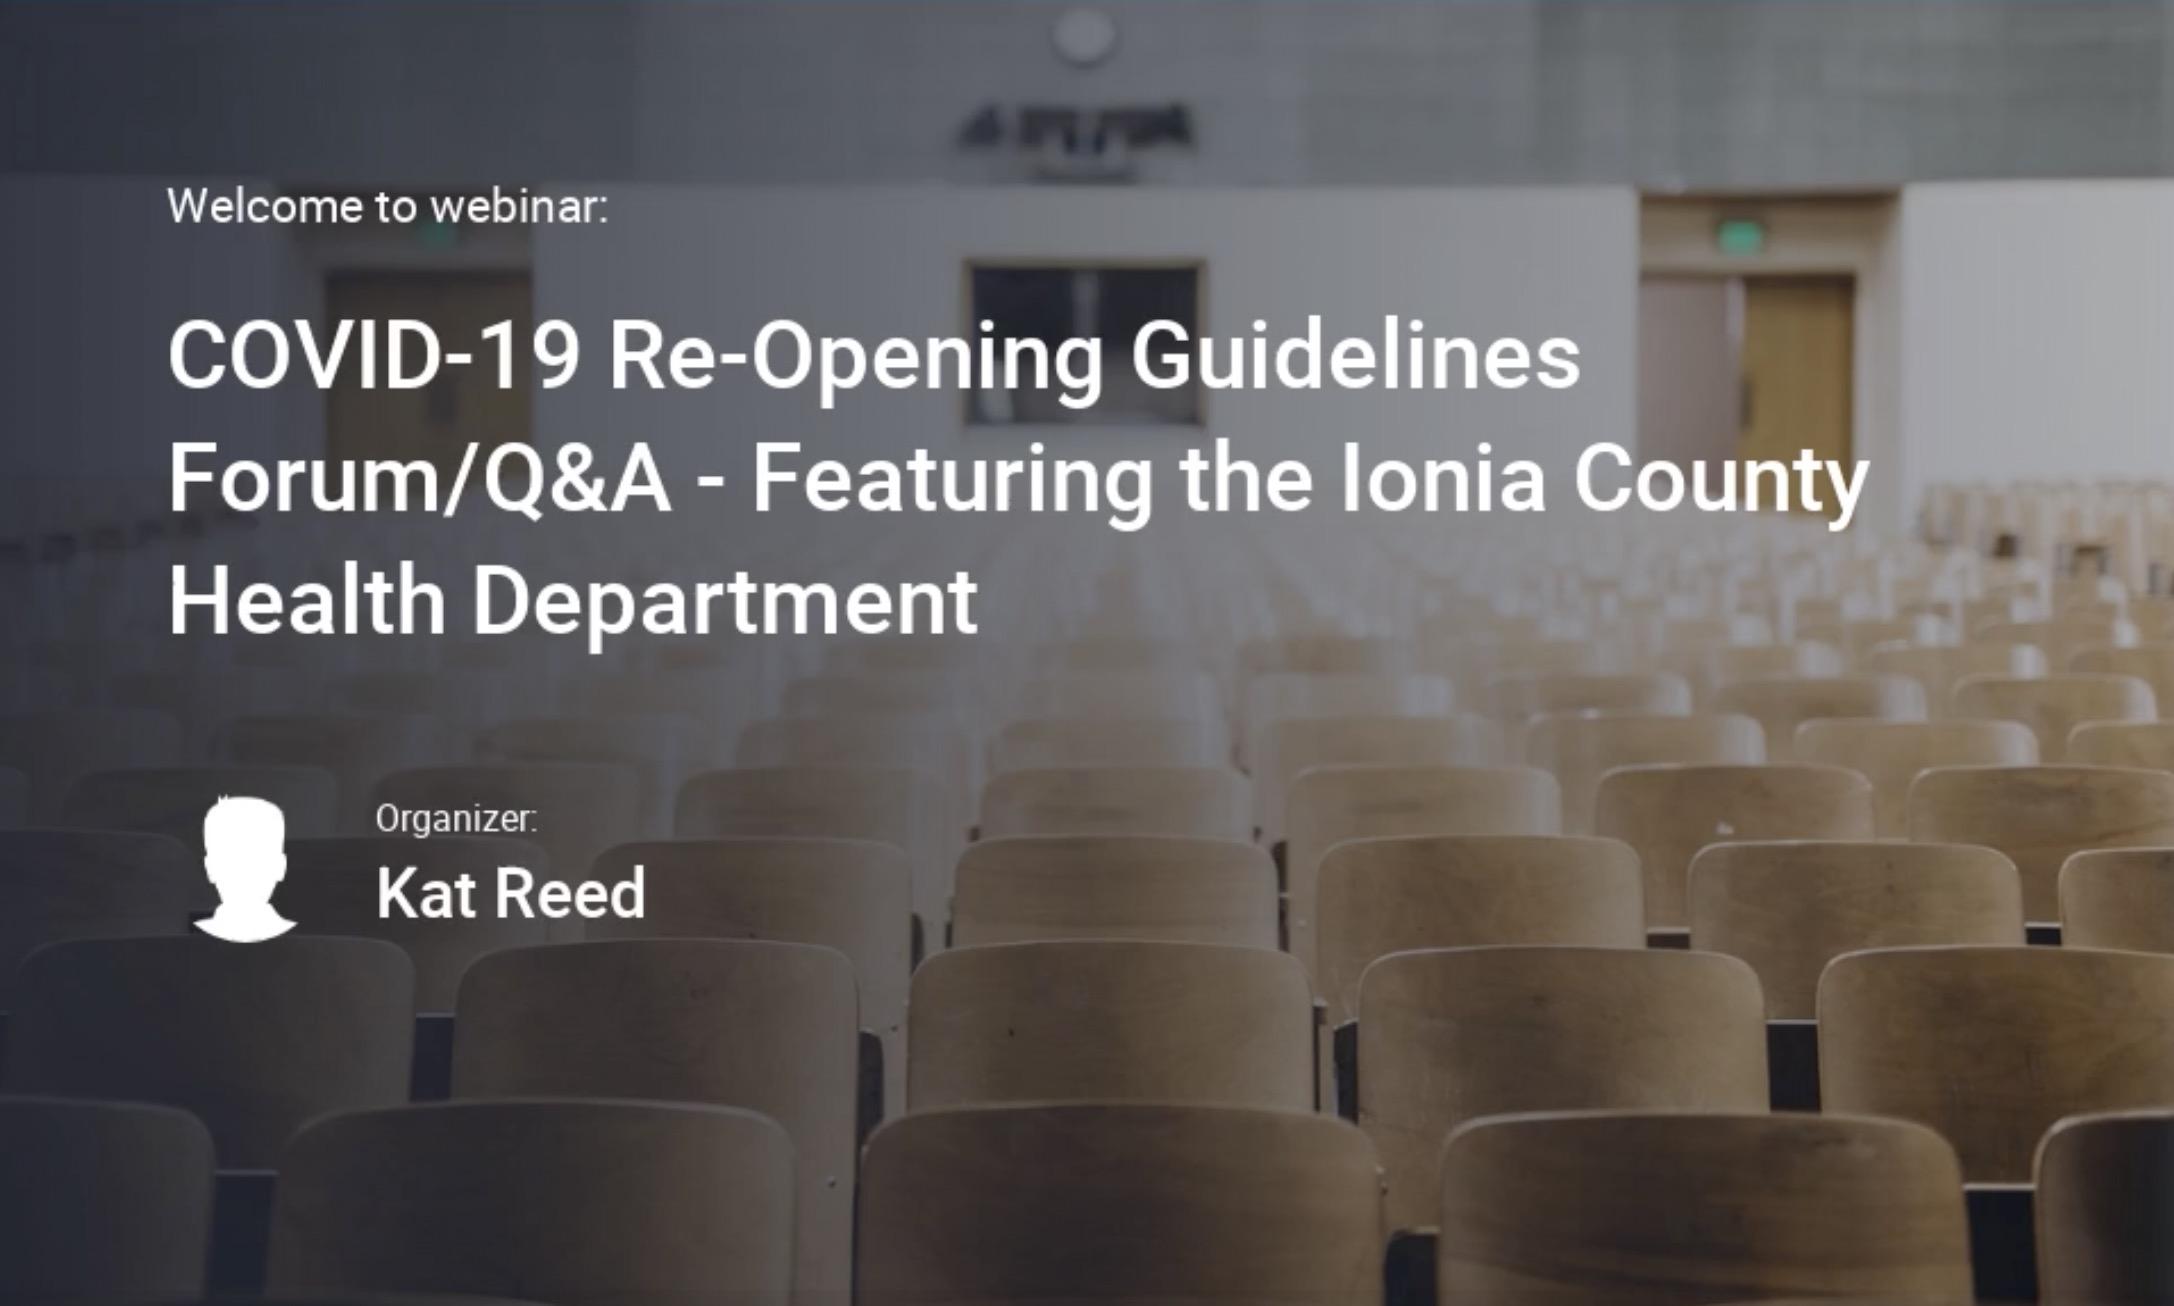 Business Re-opening Guidelines webinar